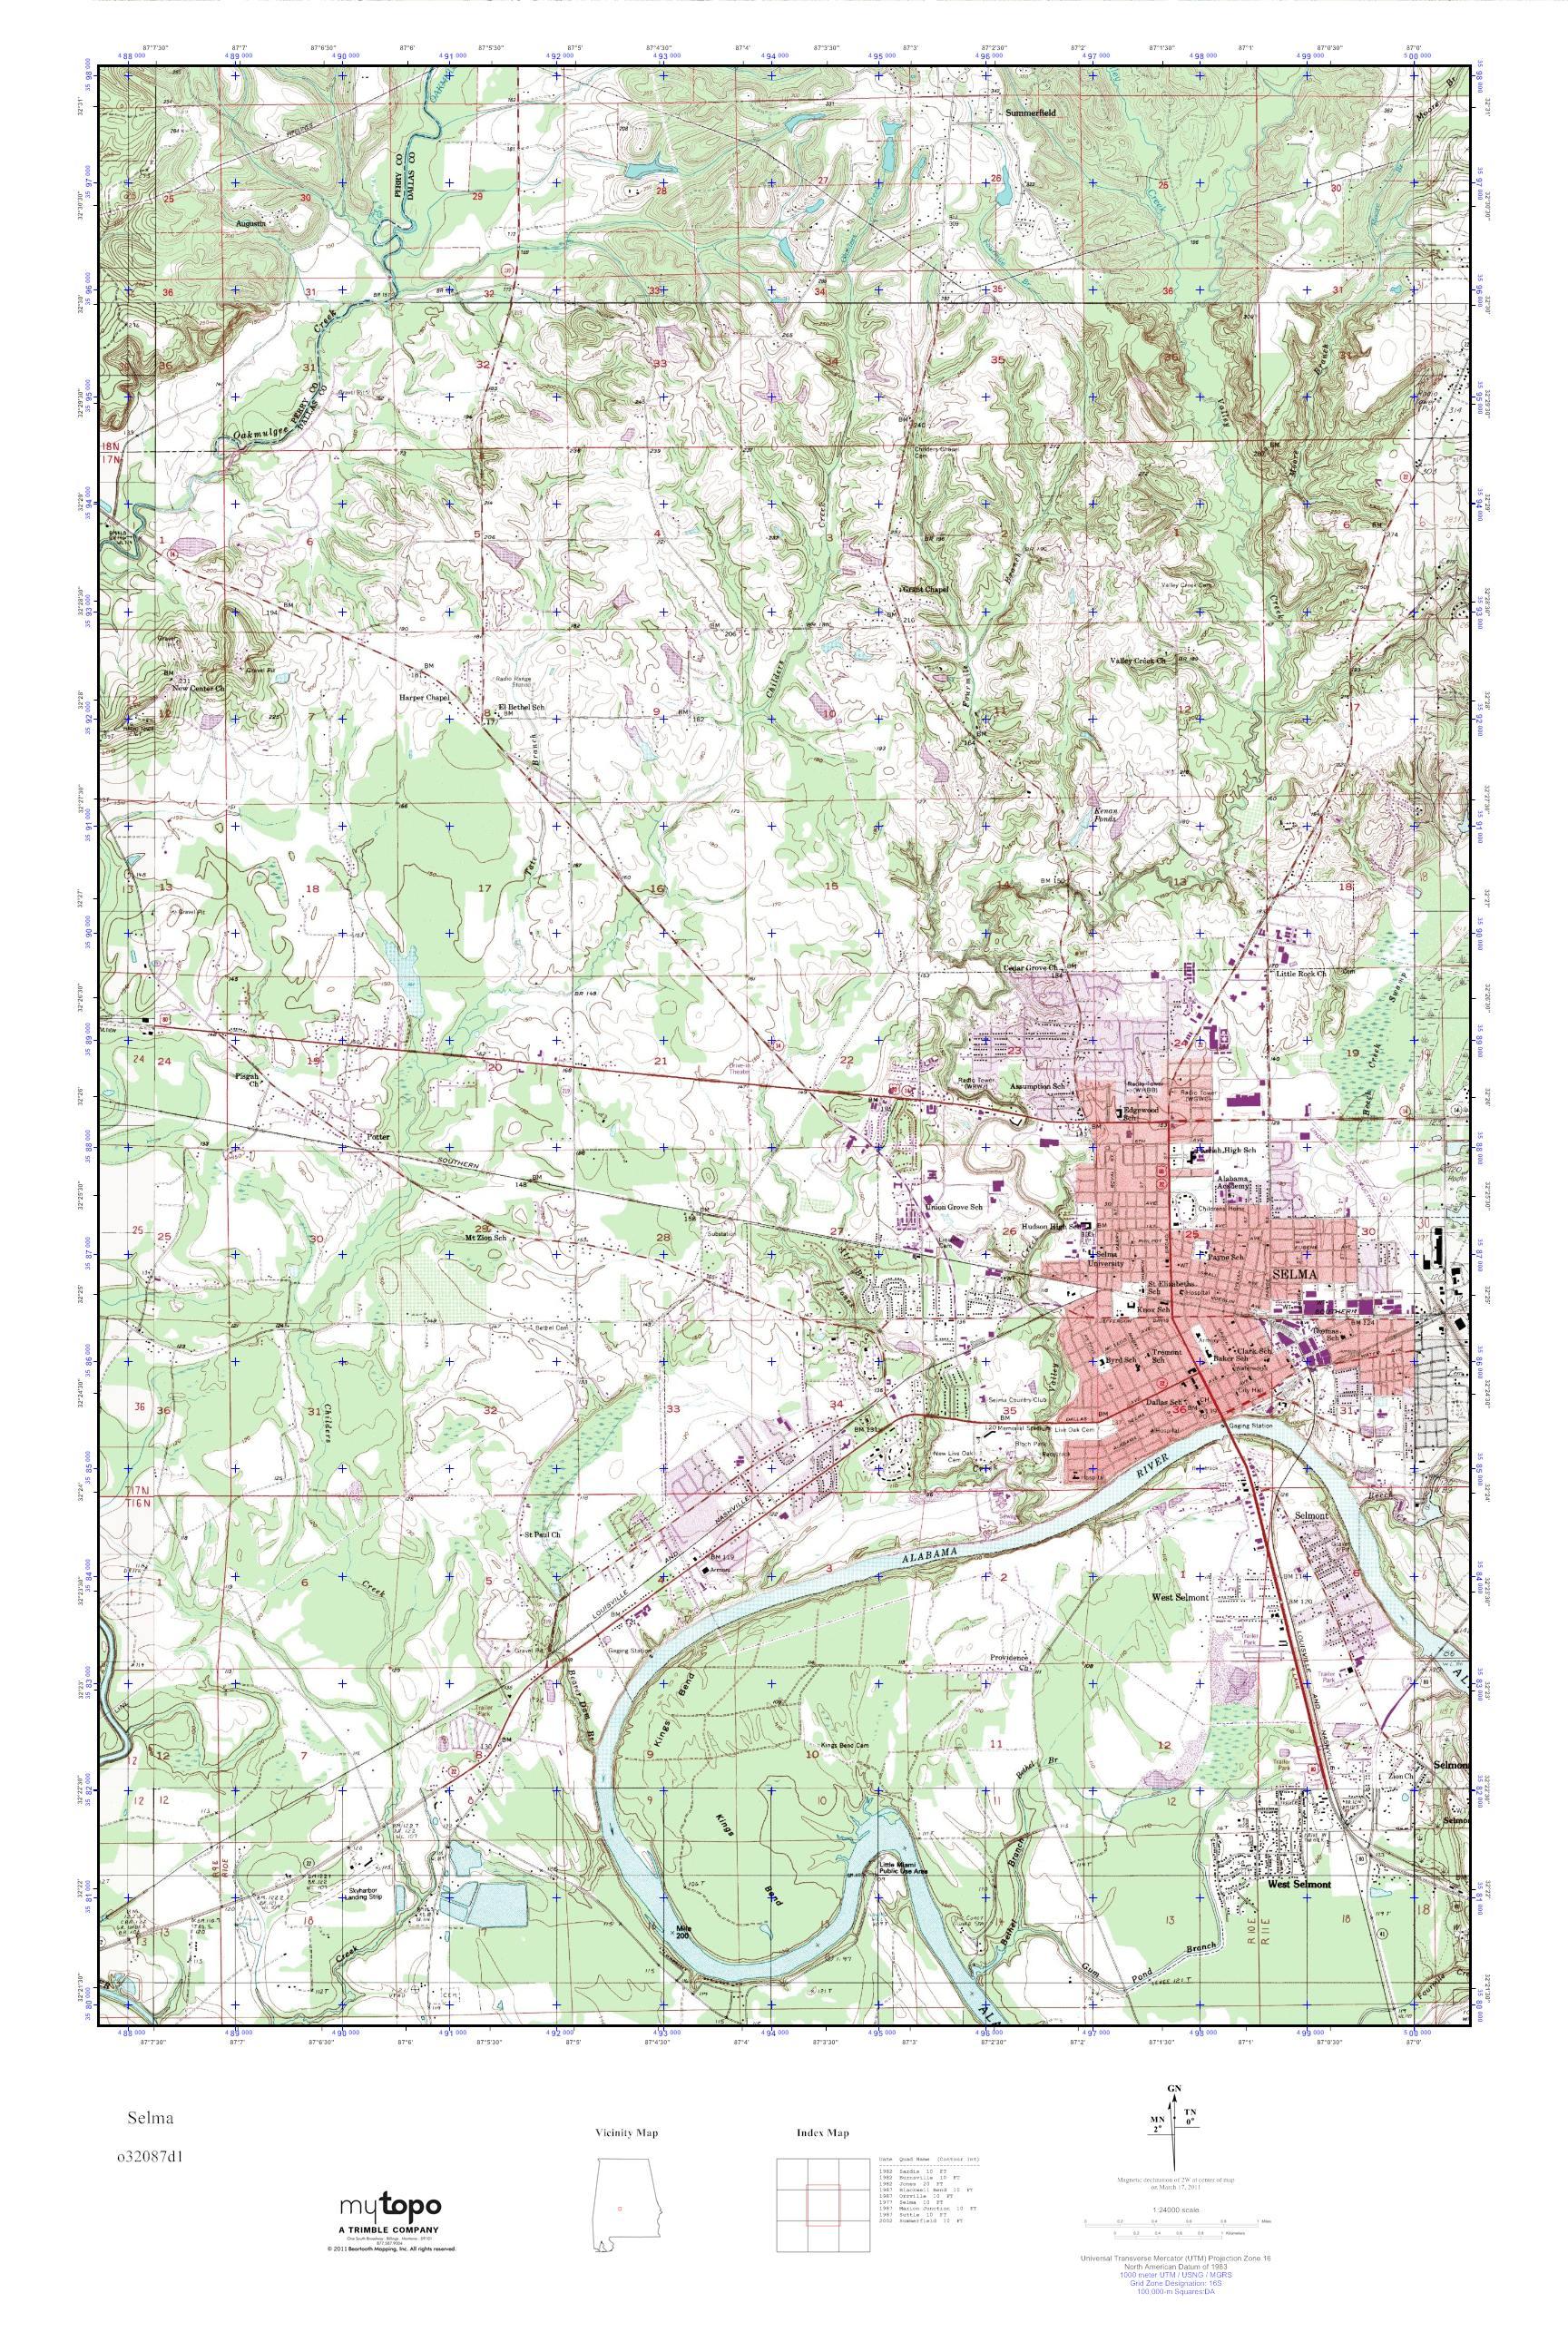 MyTopo Selma, Alabama USGS Quad Topo Map